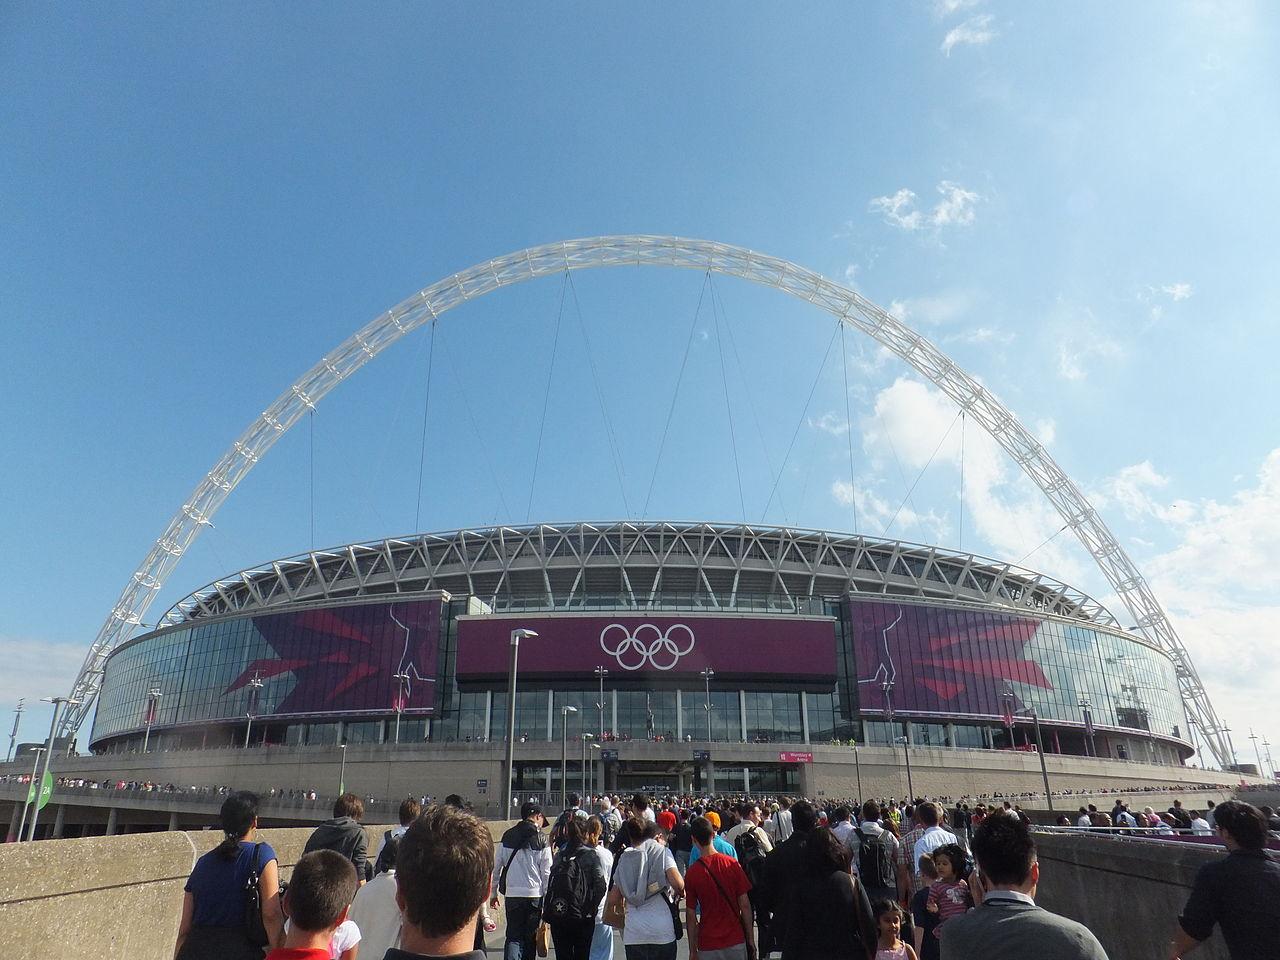 Cost Of Car Parking At Wembley Stadium